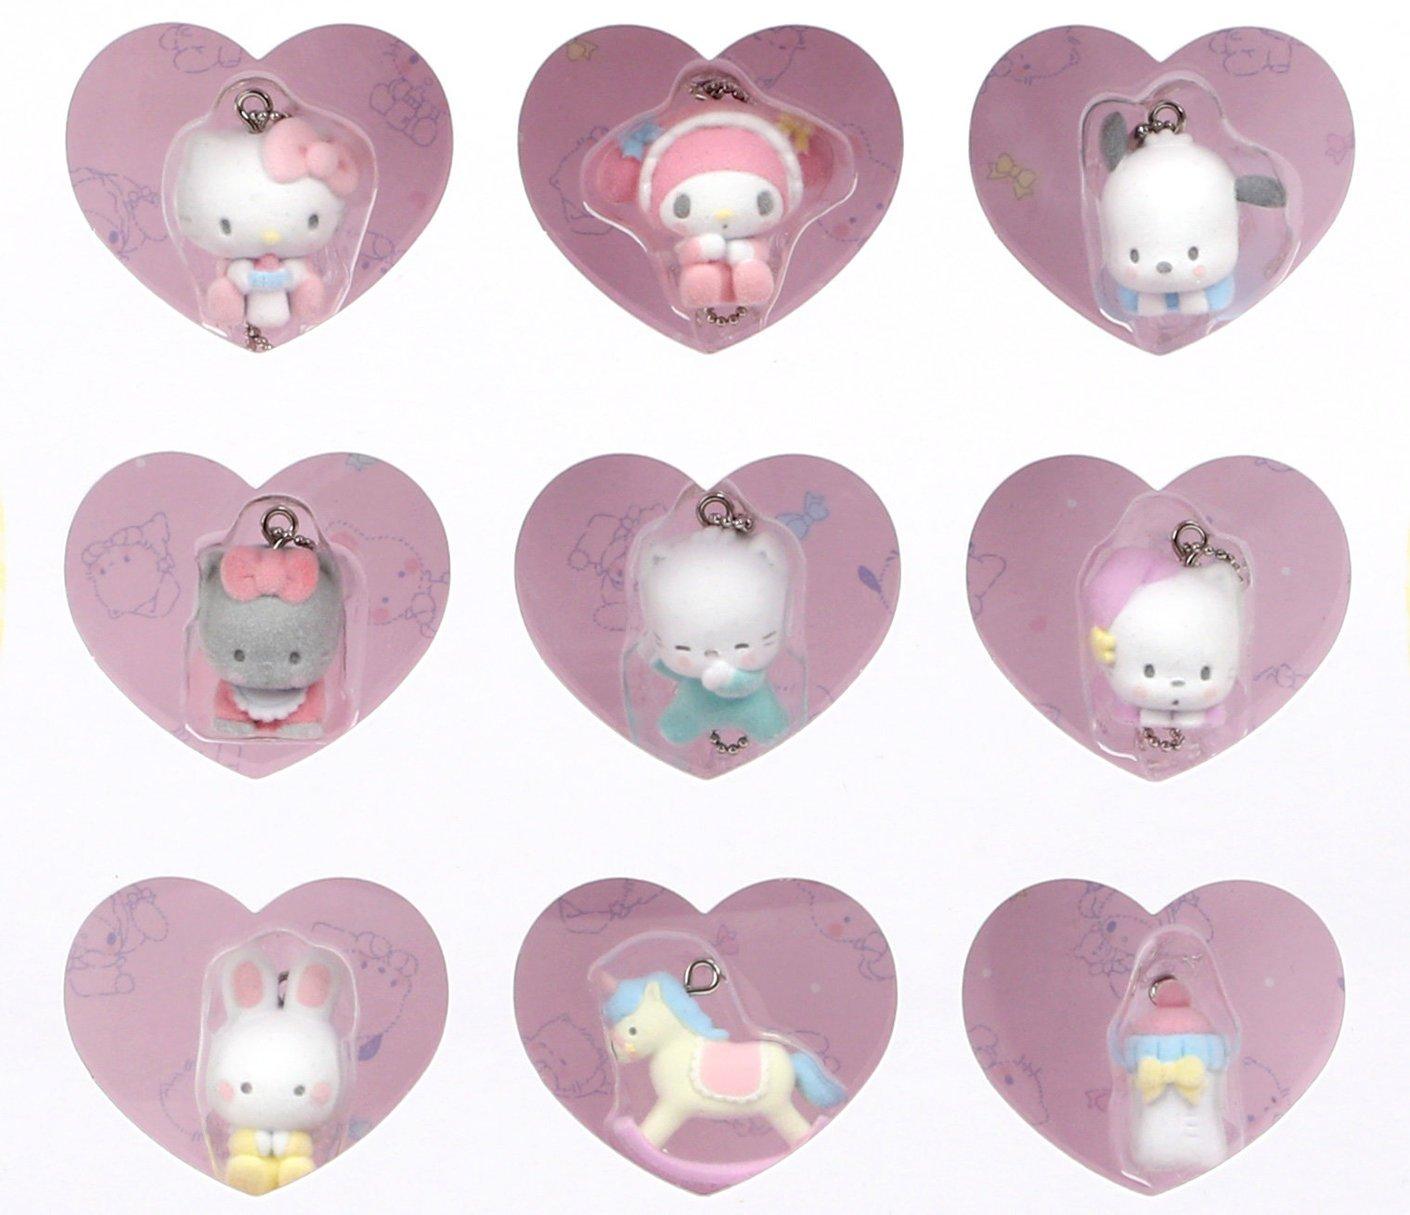 Sanrio characters 9-Piece Keychain Set: Sanrio babies